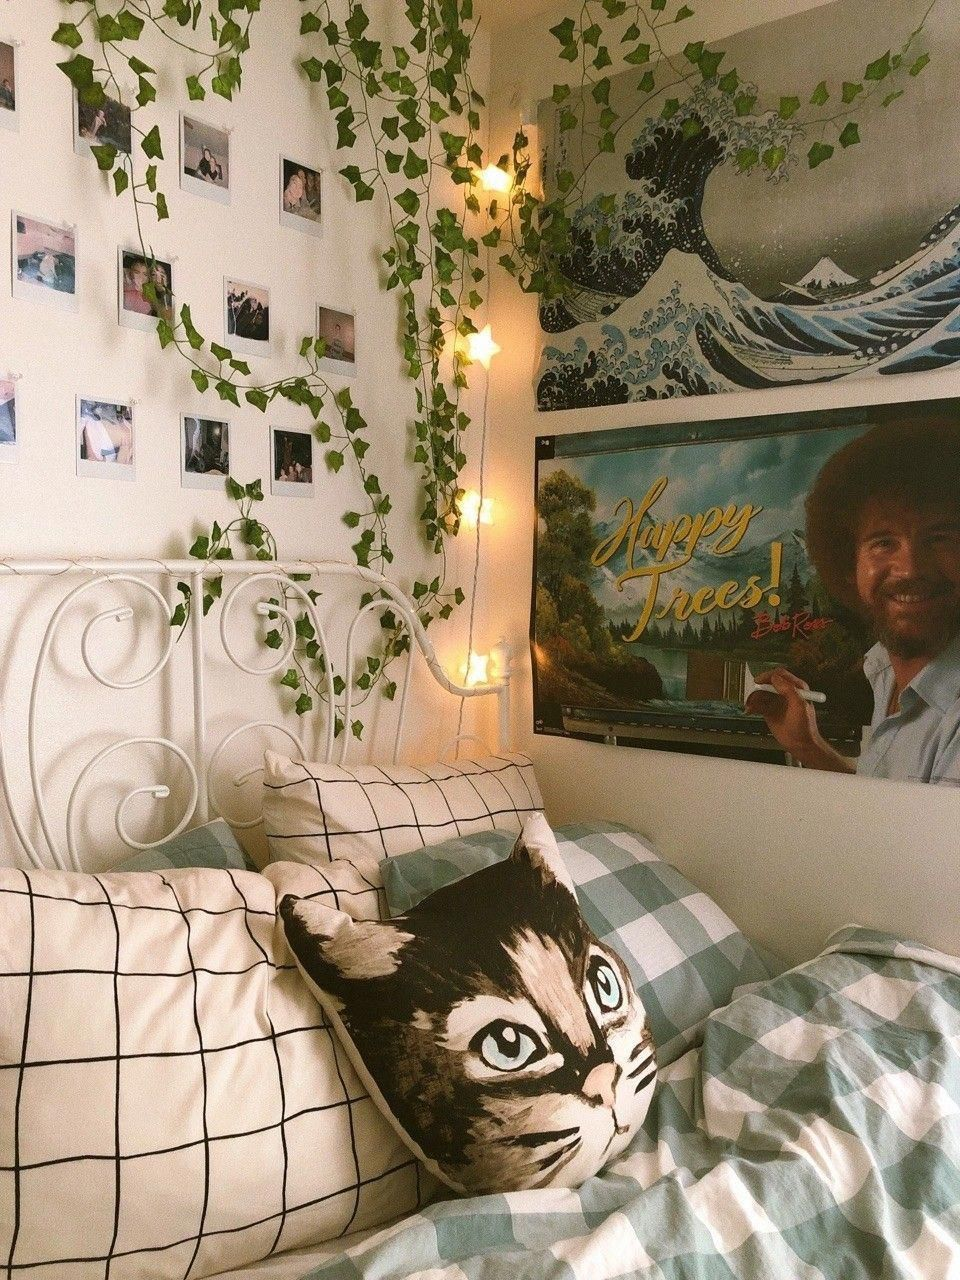 Deco Chambre Vintage Deco Chambre Indie Room Grunge Room Aesthetic Bedroom Vintage bedroom ideas pinterest